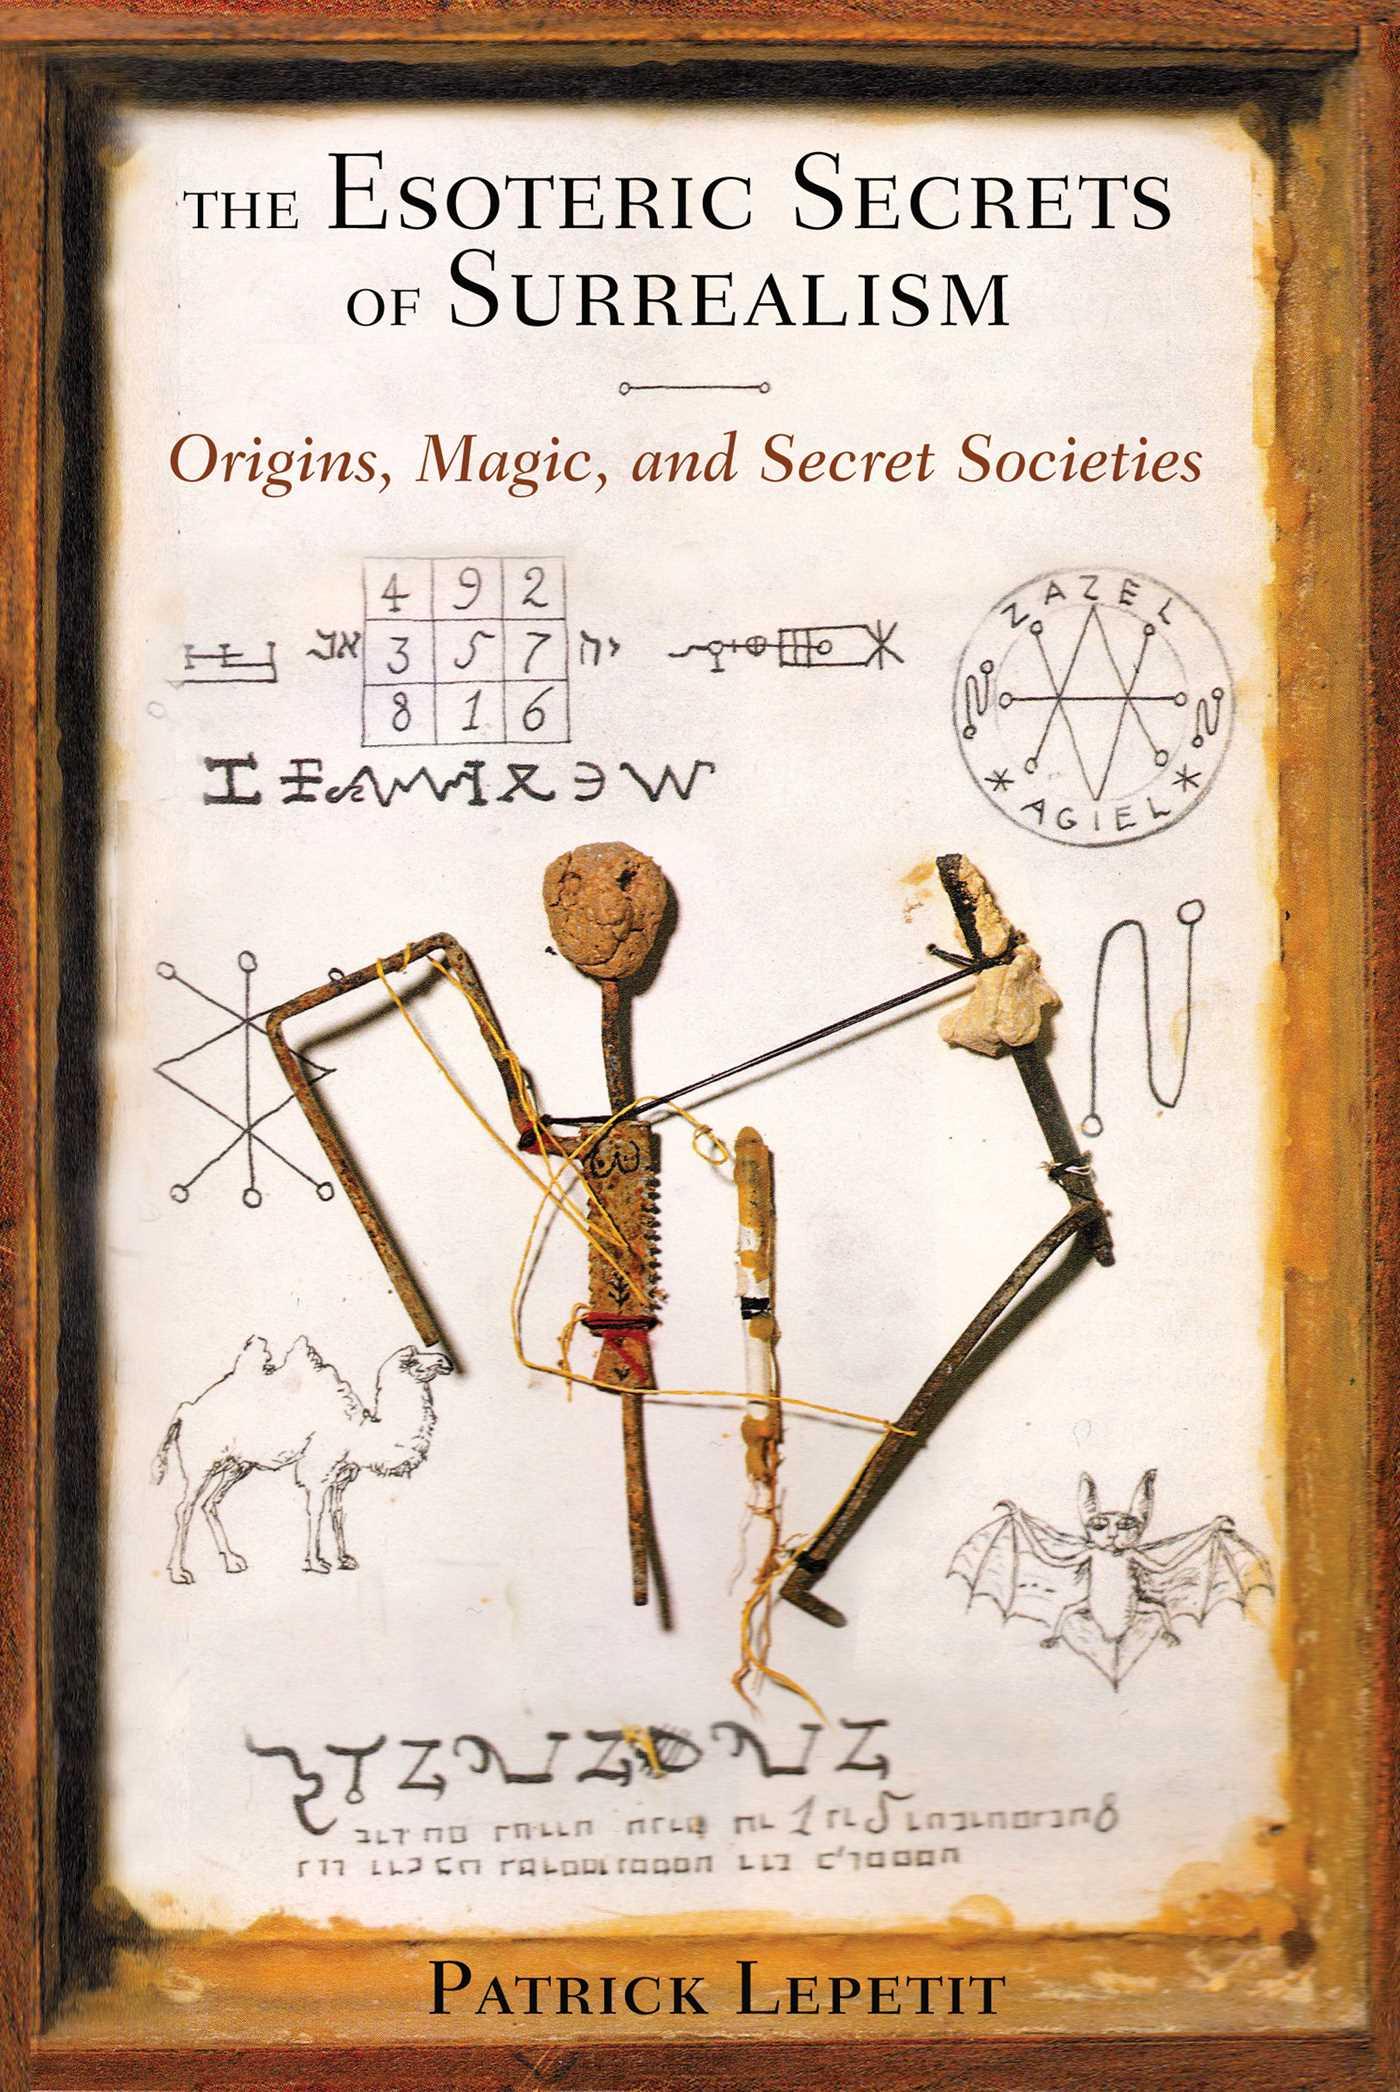 The esoteric secrets of surrealism 9781620551769 hr